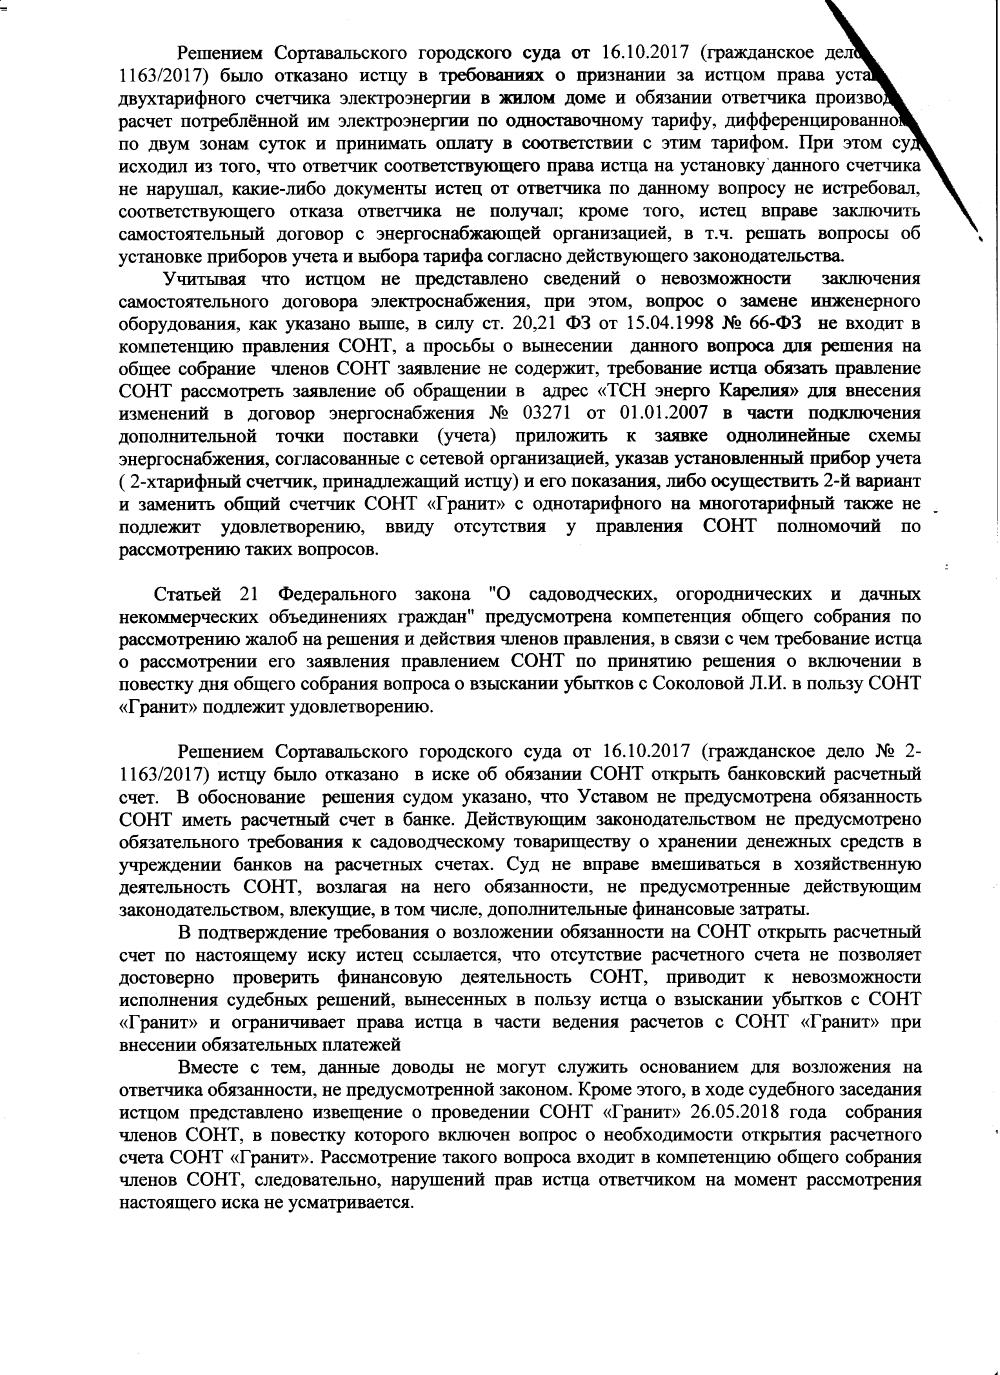 https://sontgranit.ru/forum/img/sokol/20180510-решение-06.png